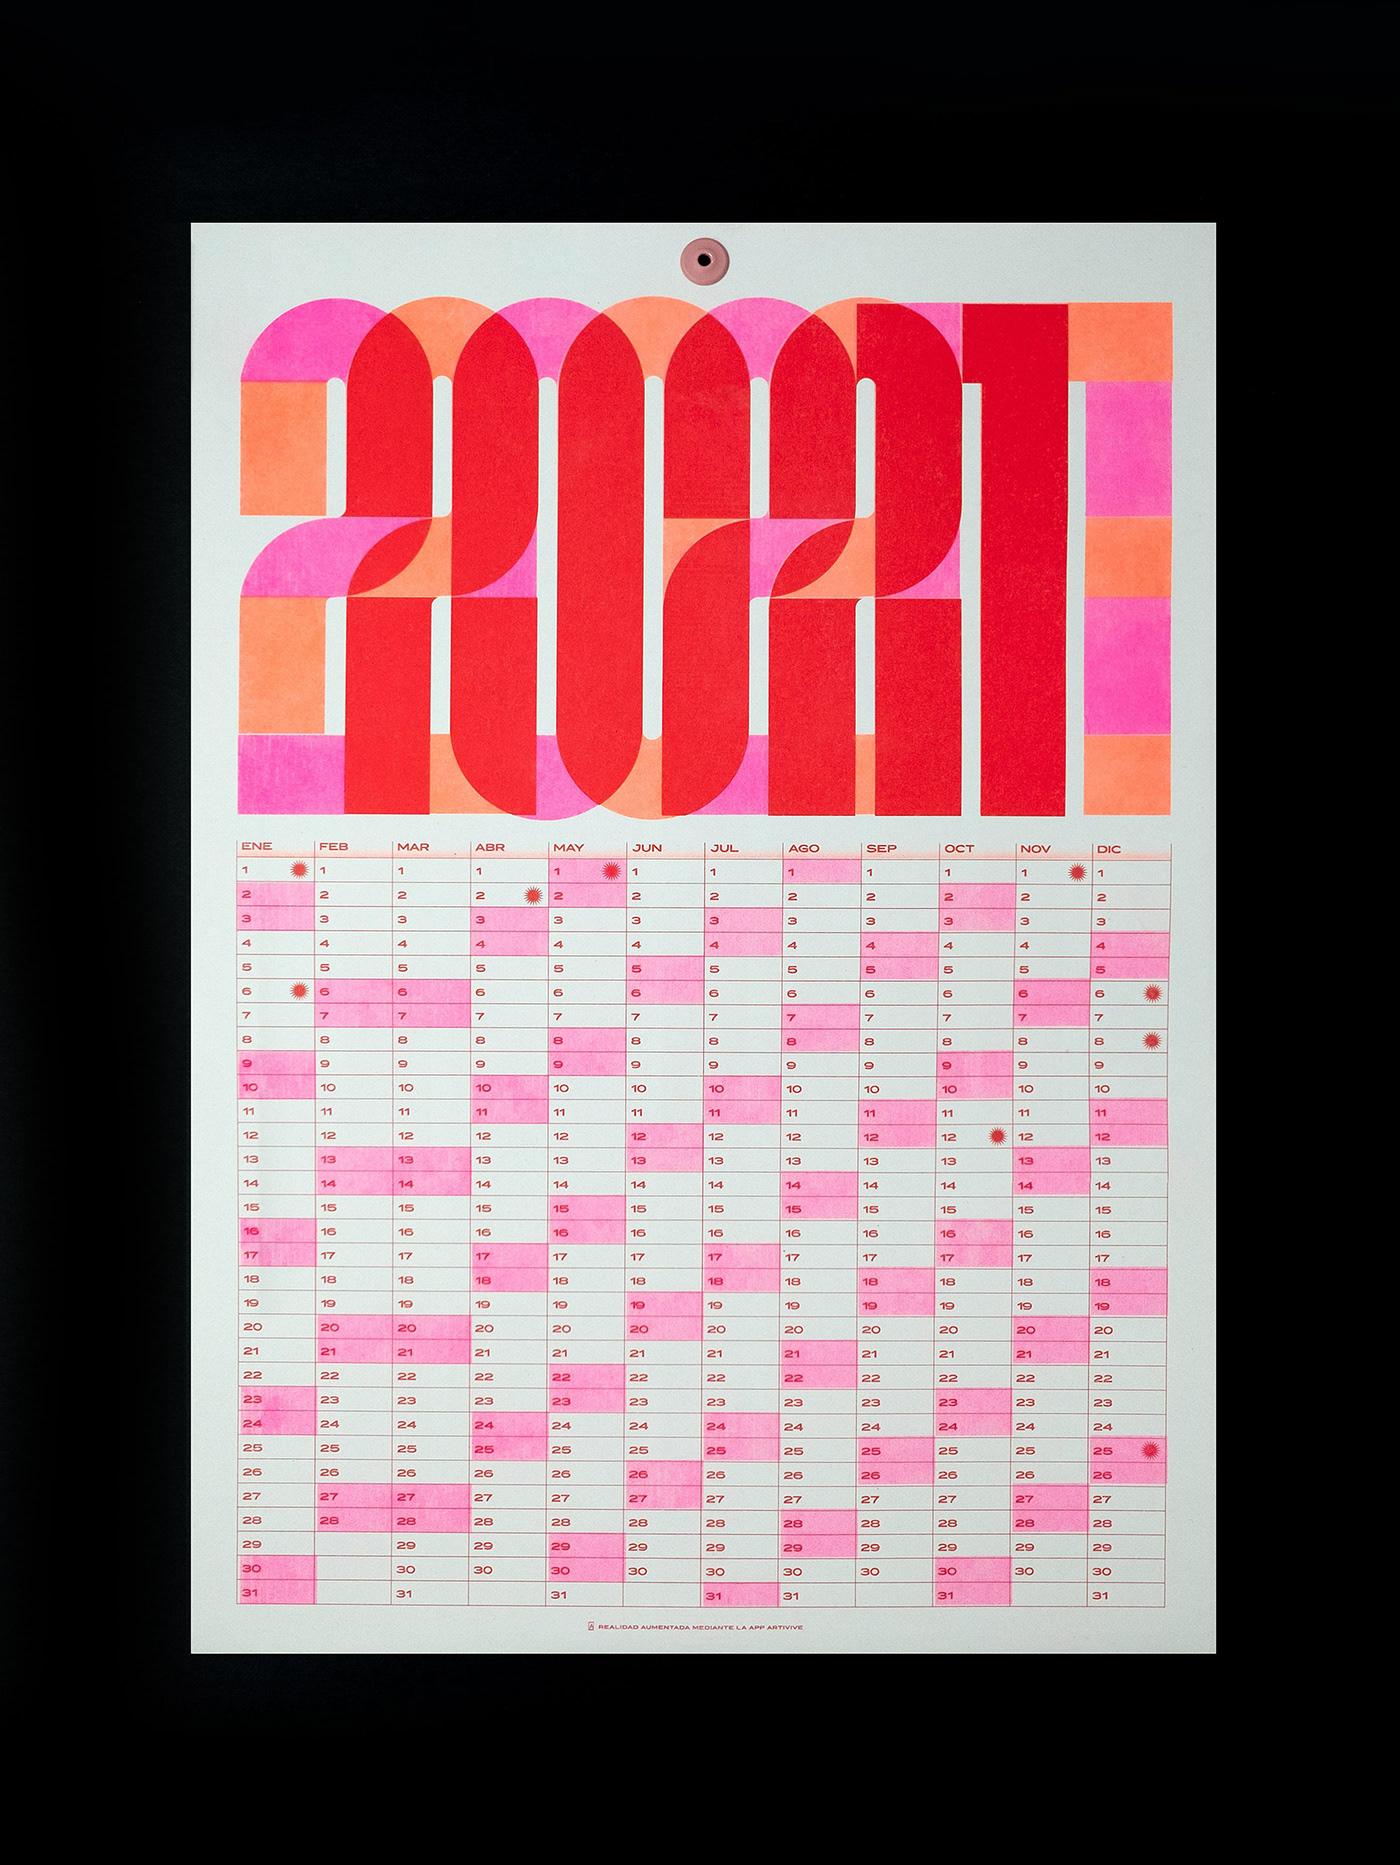 2021 calendar calendar print risografia risograph